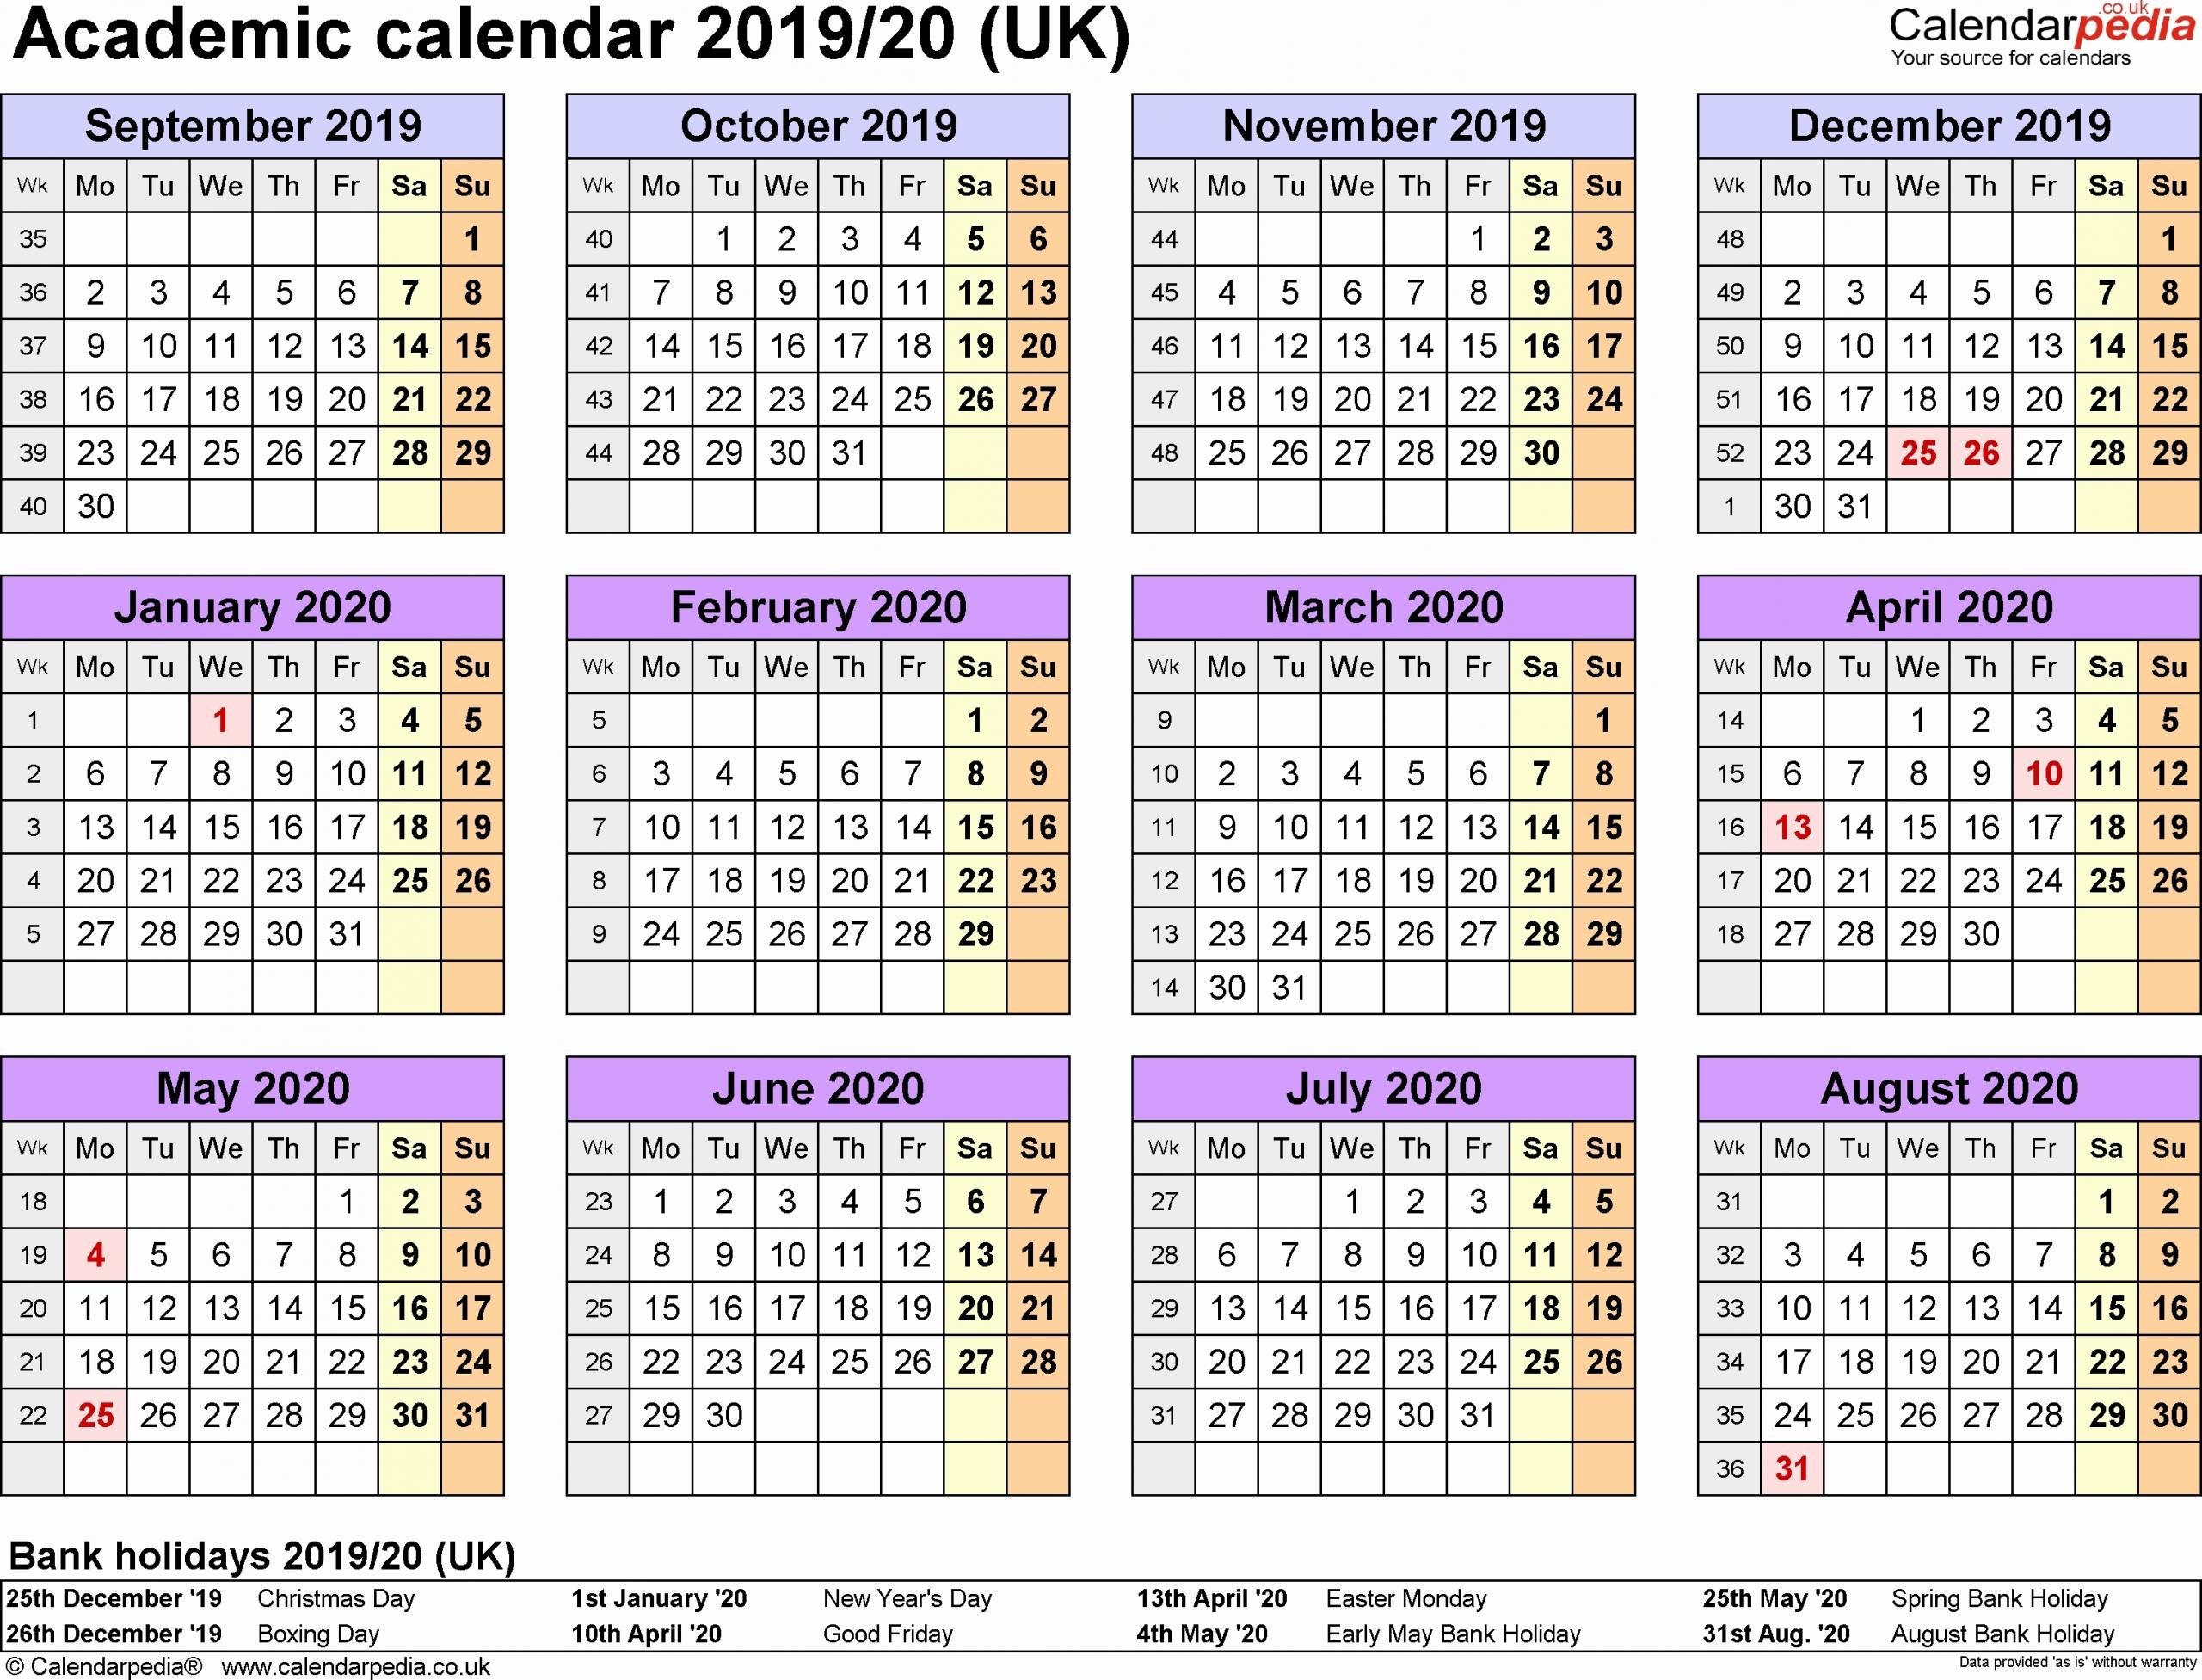 Tdsb Calendar 2020. 🏷️ Tdsb School Calendar 2020. 2019-09-24